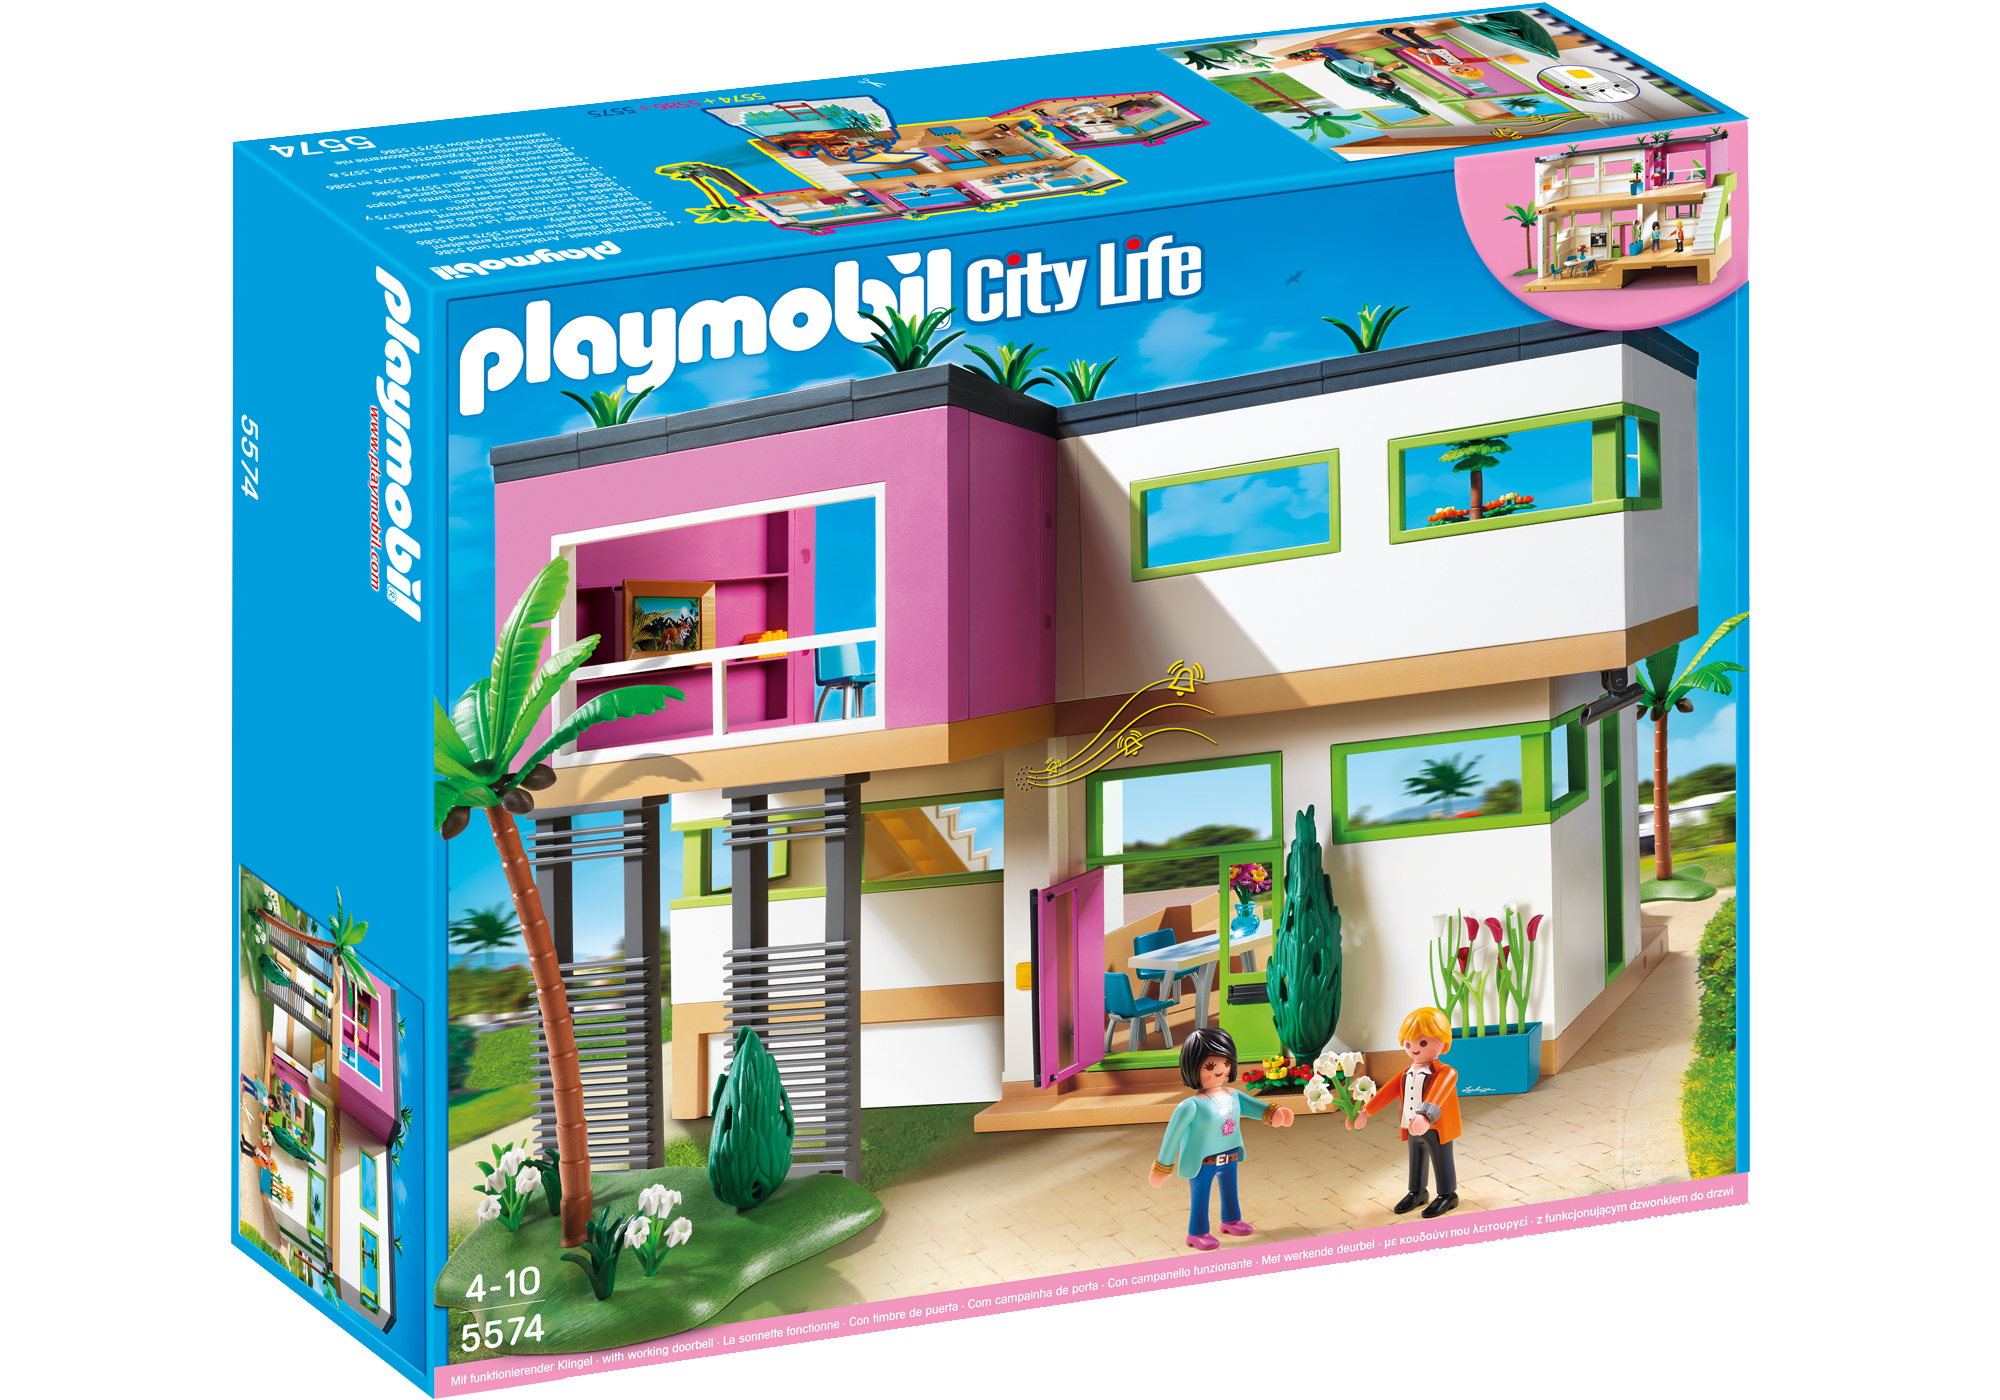 Http://media.playmobil.com/i/playmobil/5574_product_box_front/